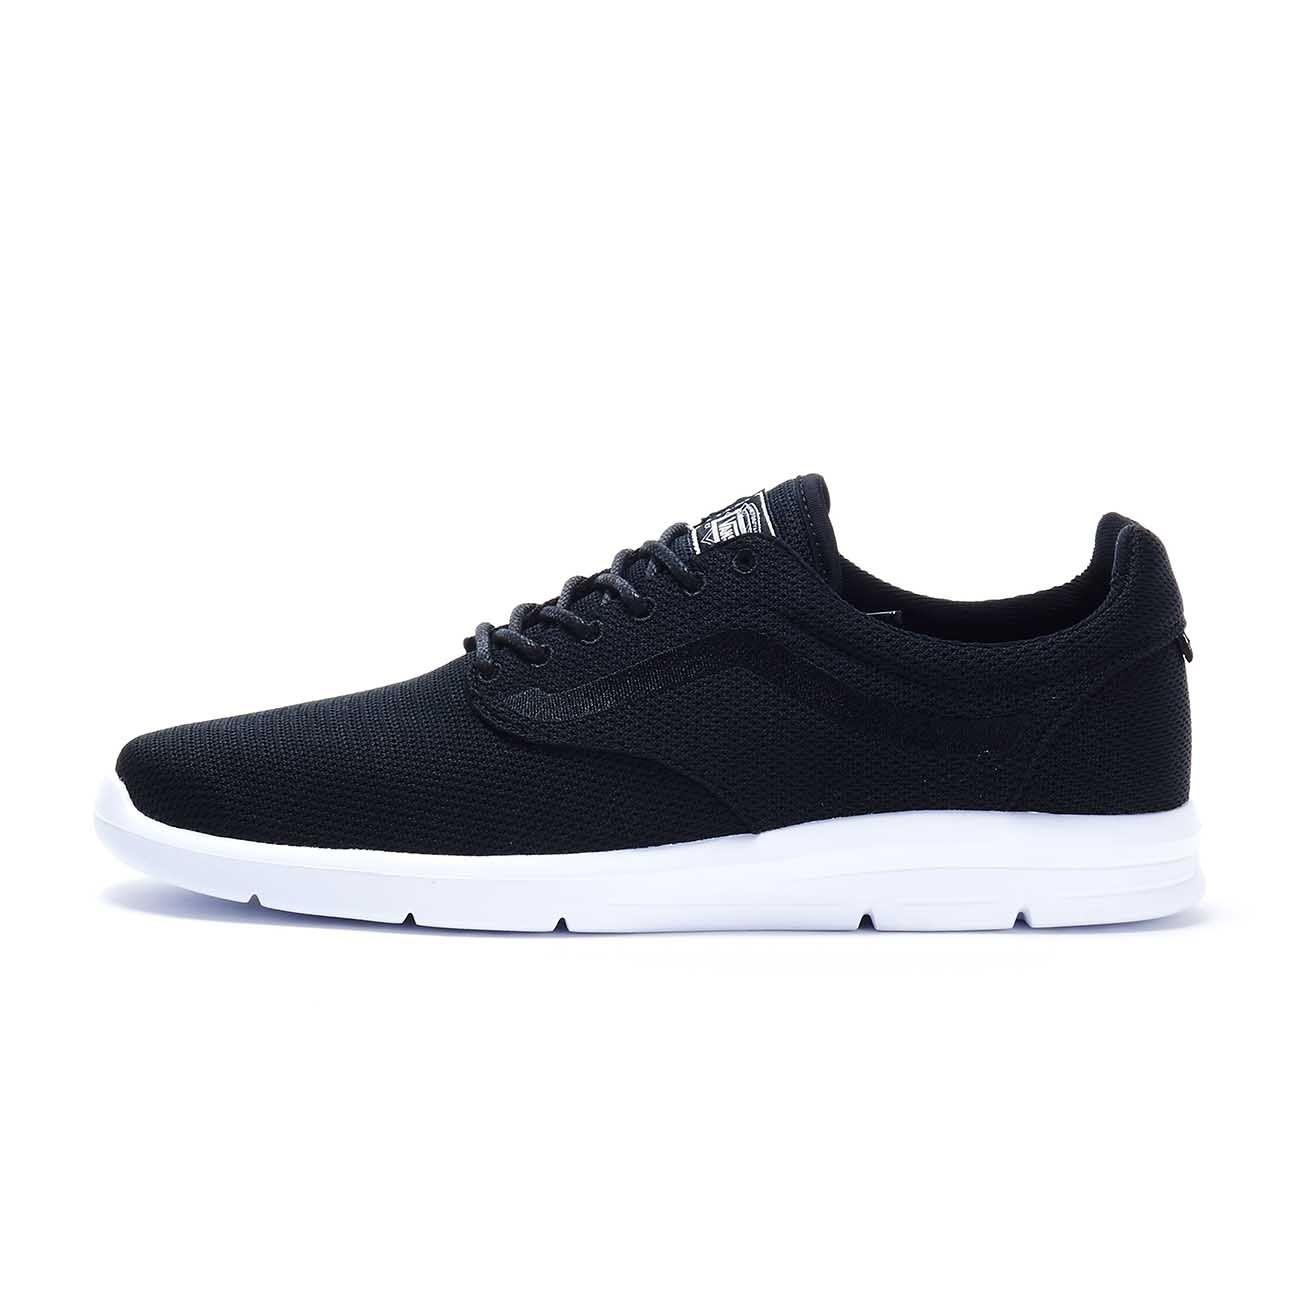 VANS SNEAKERS ISO 1.5 Uomo Black   Mascheroni Sportswear